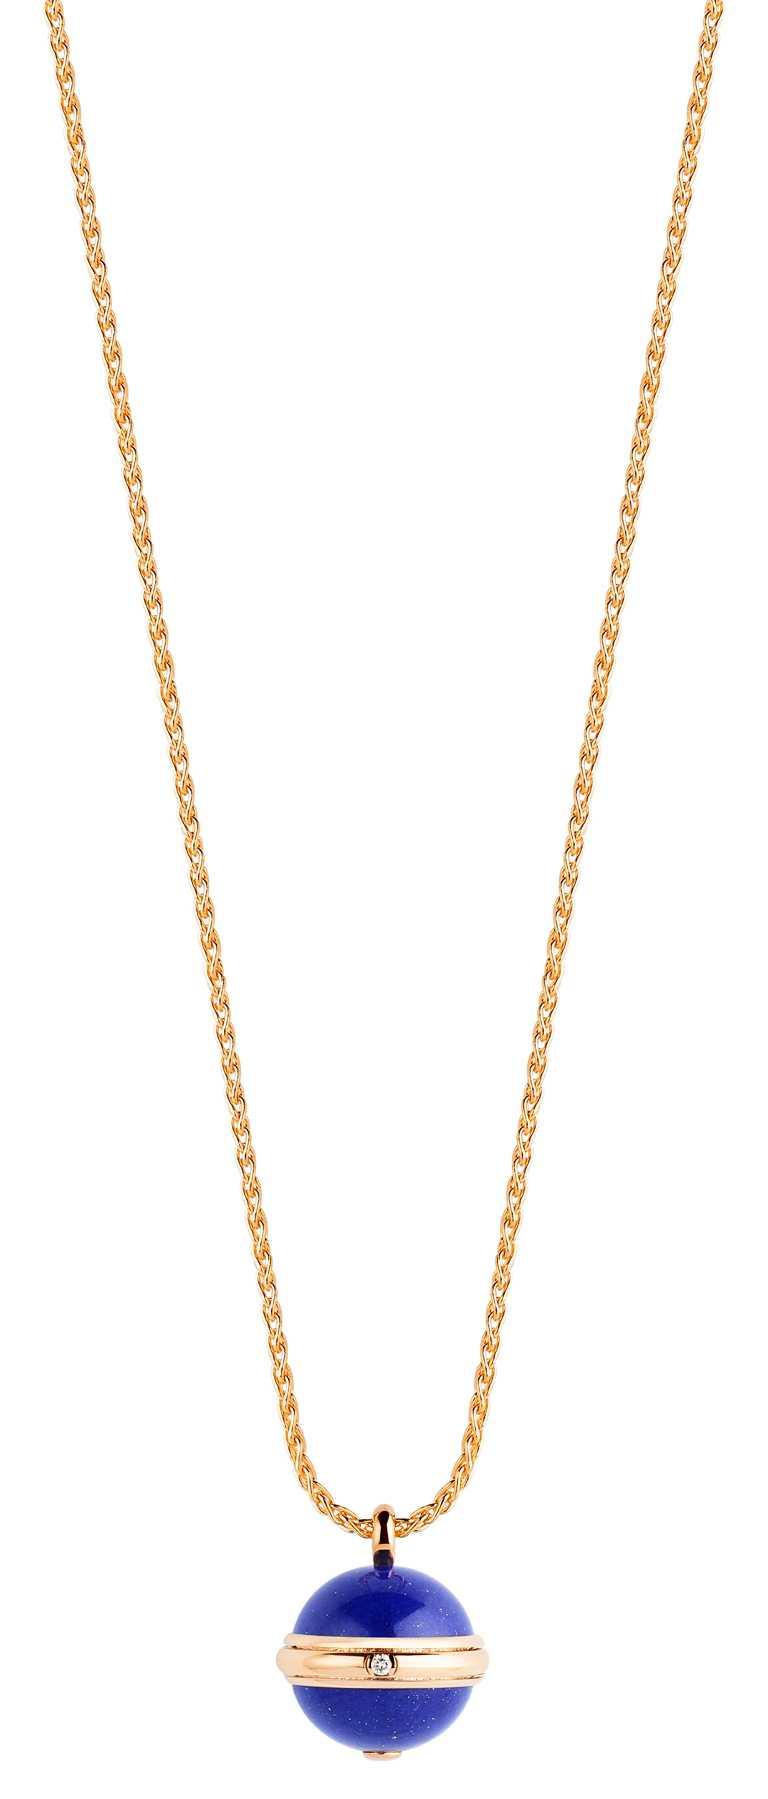 PIAGET「Possession」系列,玫瑰金青金石鑽石墜鍊╱218,000元。(圖╱PIAGET提供)